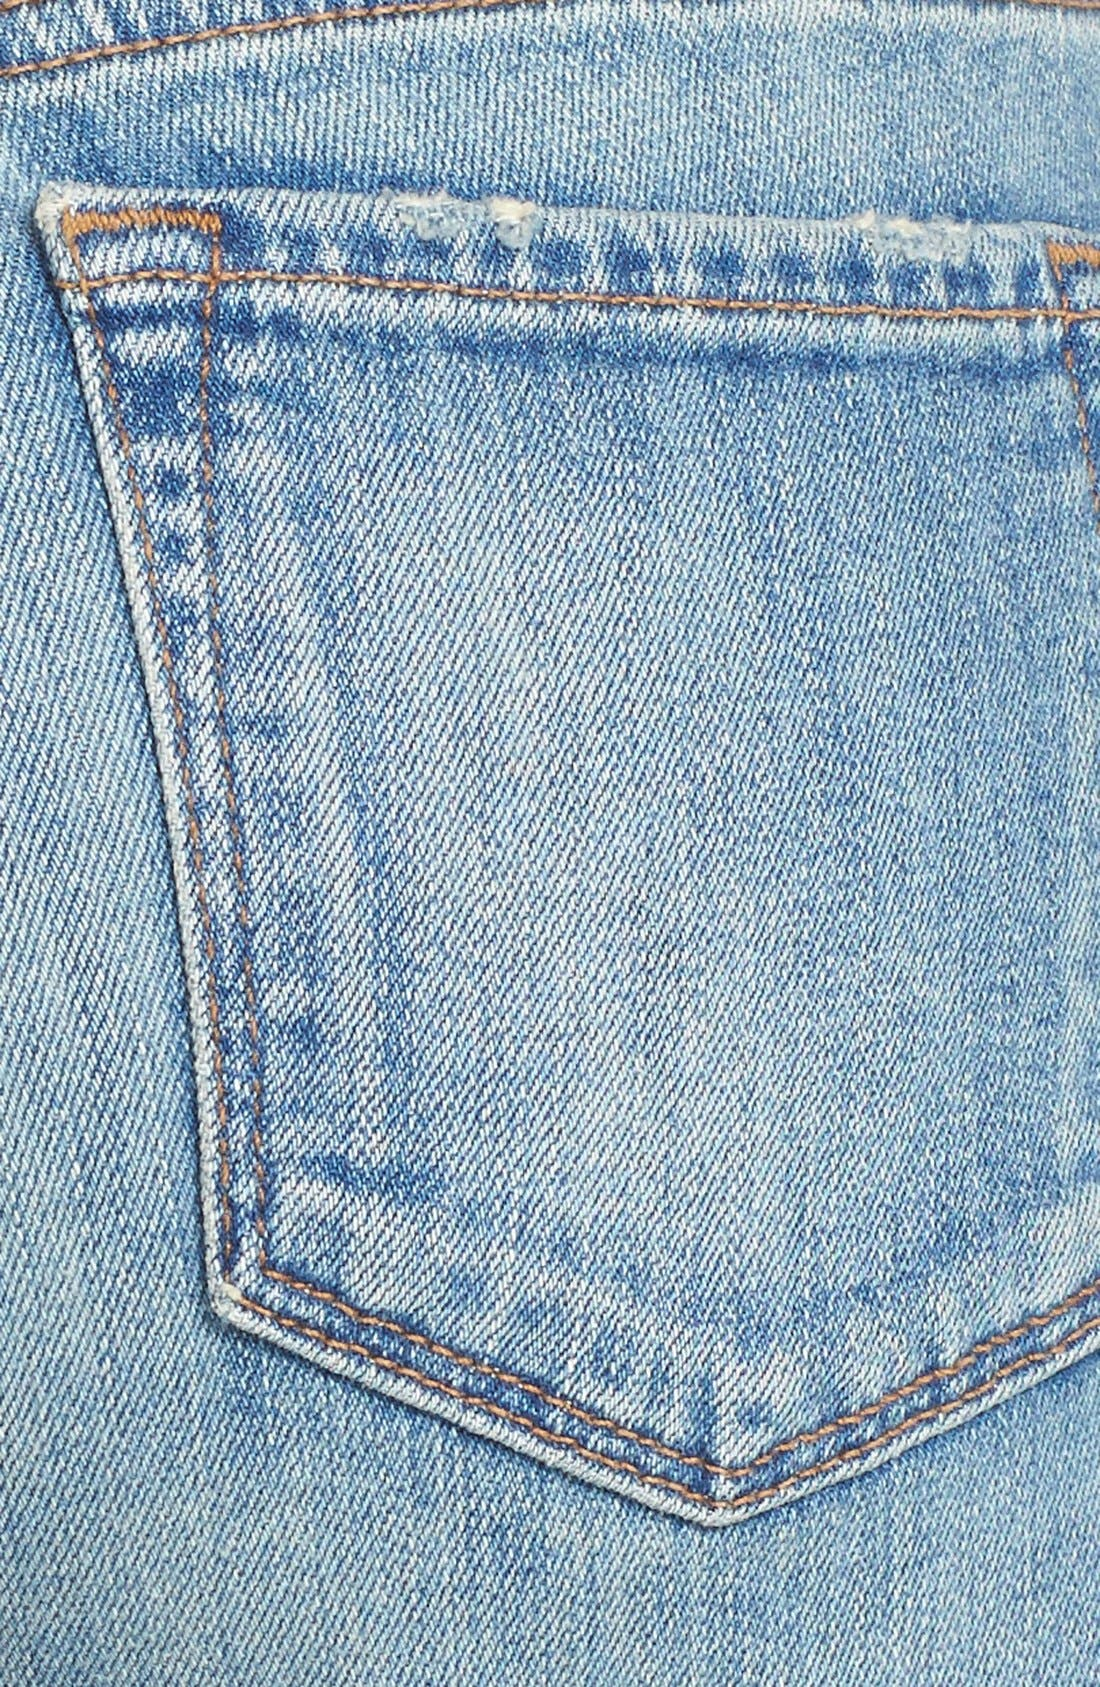 Alternate Image 3  - J Brand 'Jake' Skinny Boyfriend Jeans (Landslide)